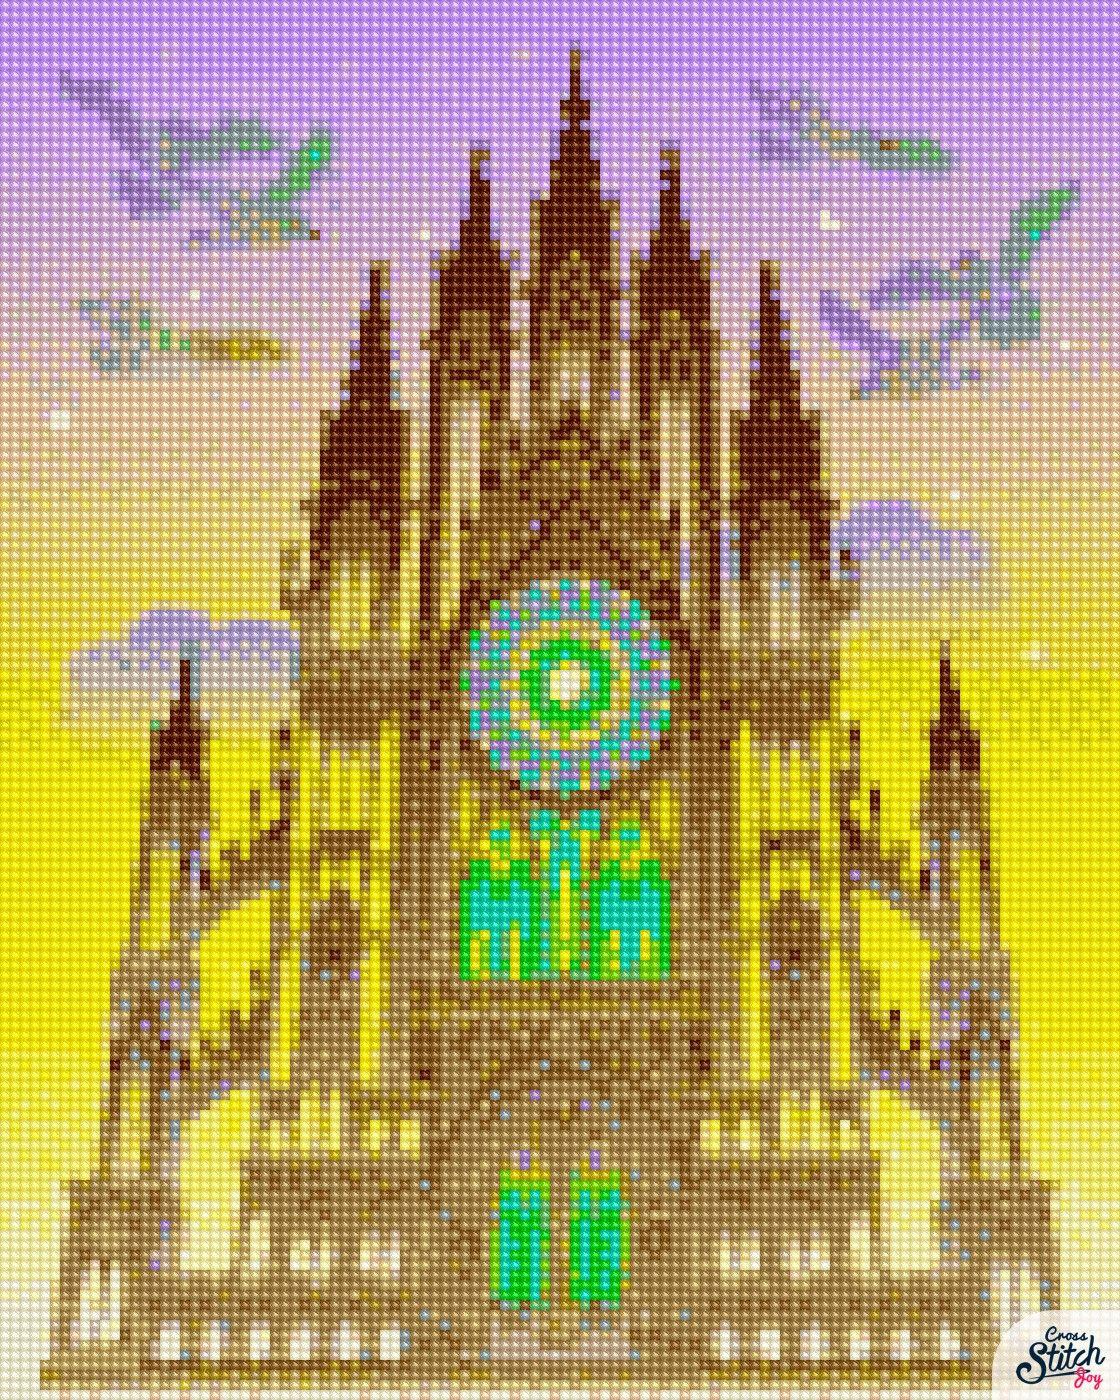 Pin by Tokochkoidze on Cross titch joy Stitch app, Cross